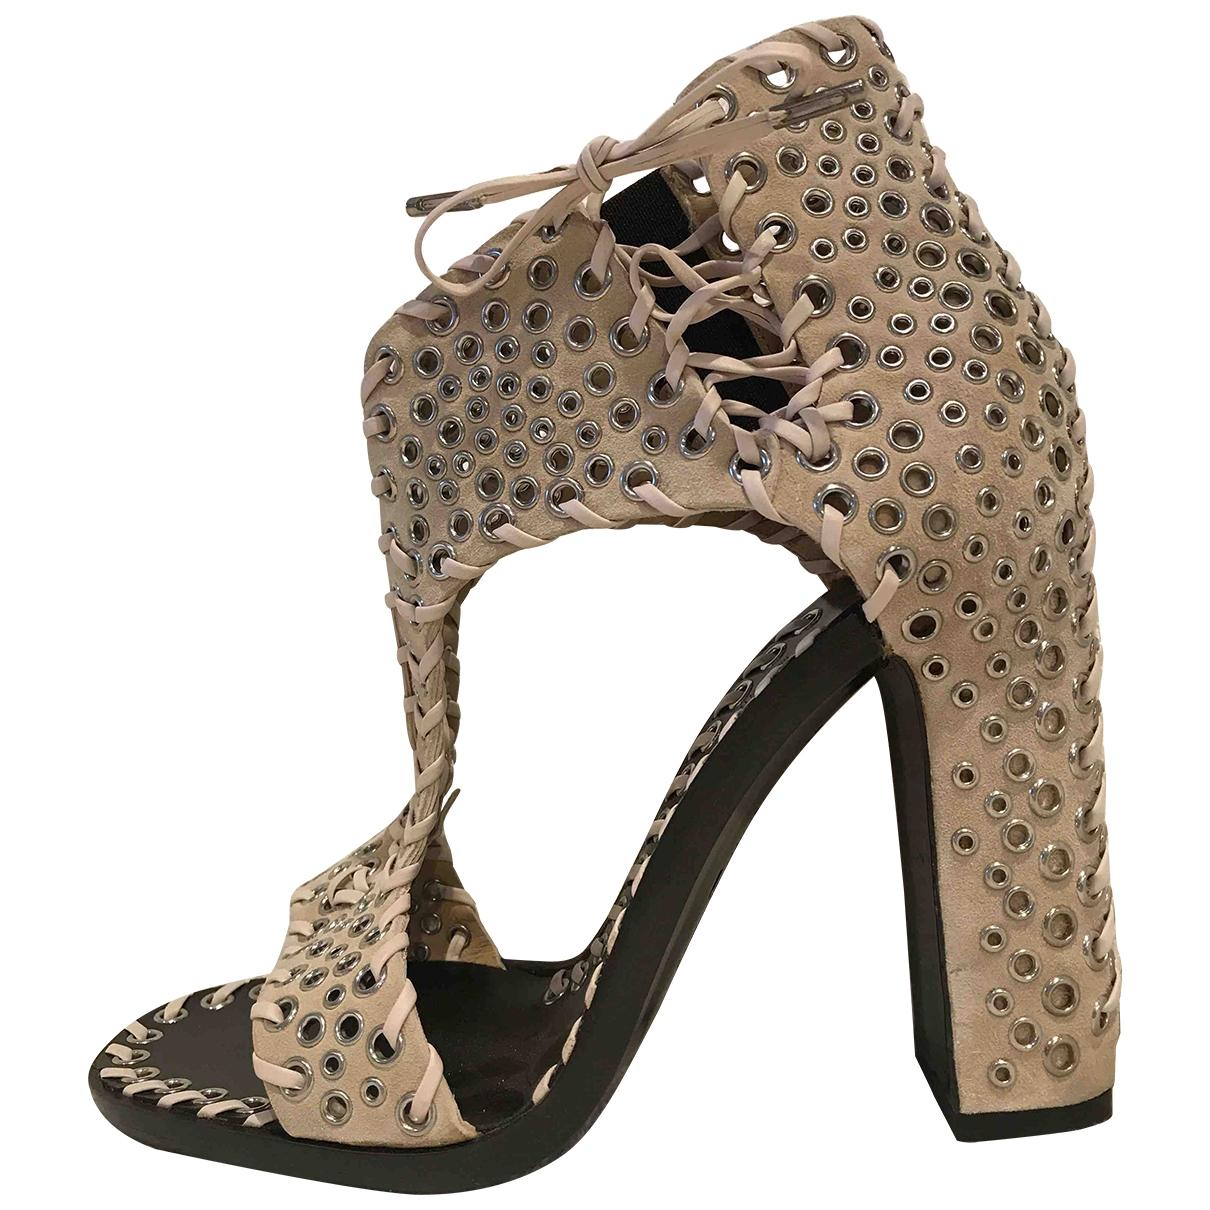 Salvatore Ferragamo \N Beige Suede Sandals for Women 37.5 EU